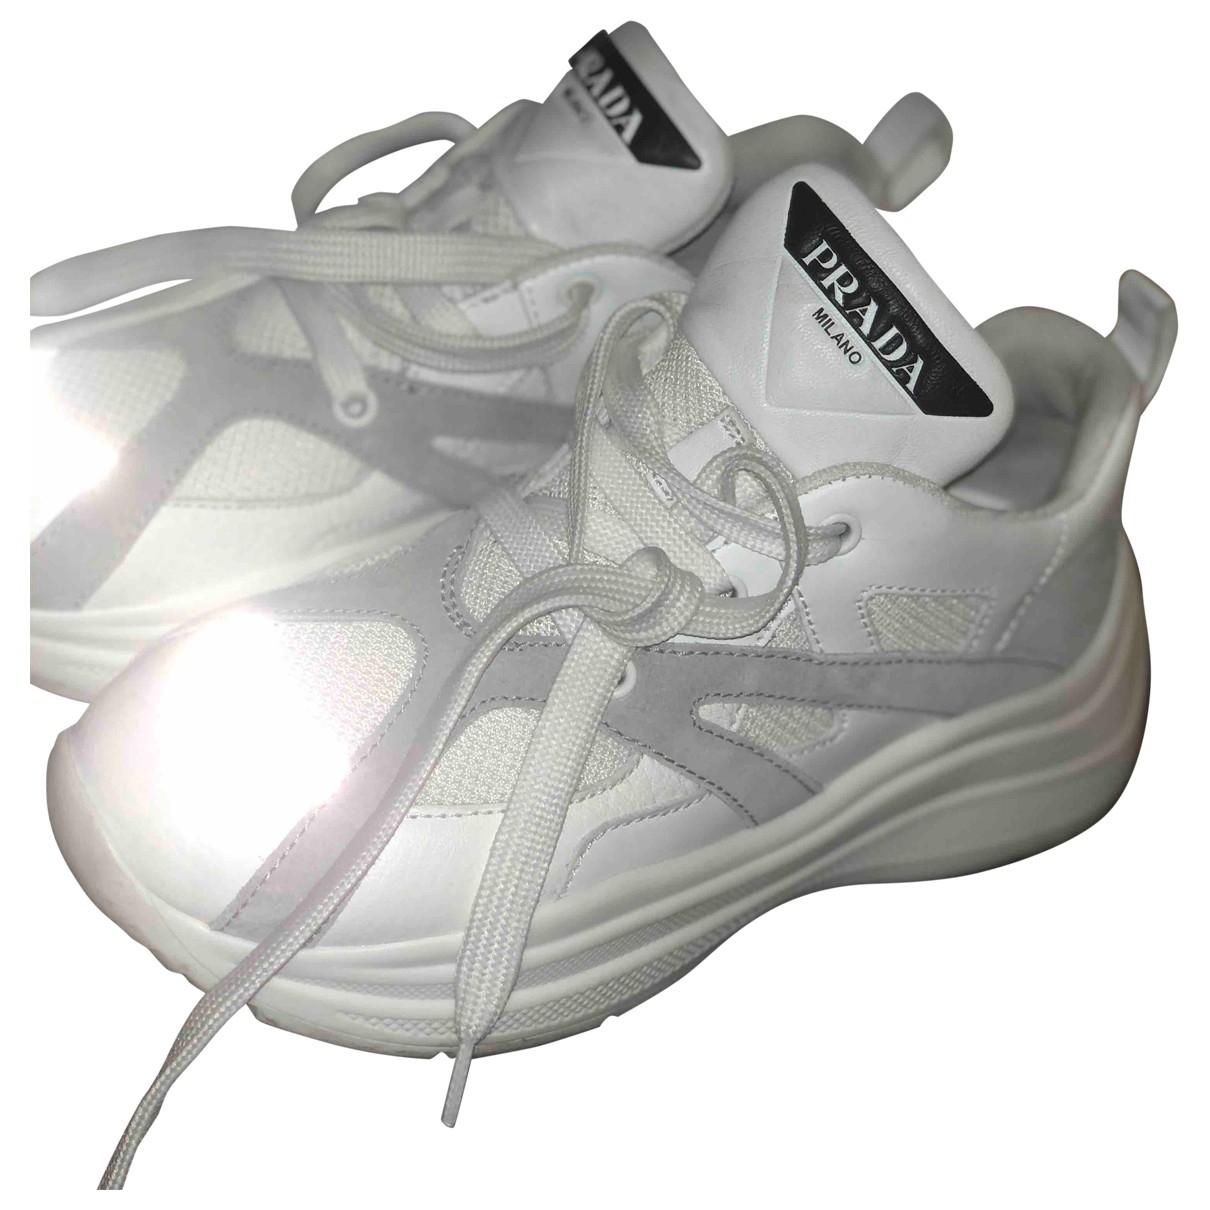 Prada - Baskets Cloudbust pour femme en cuir - blanc